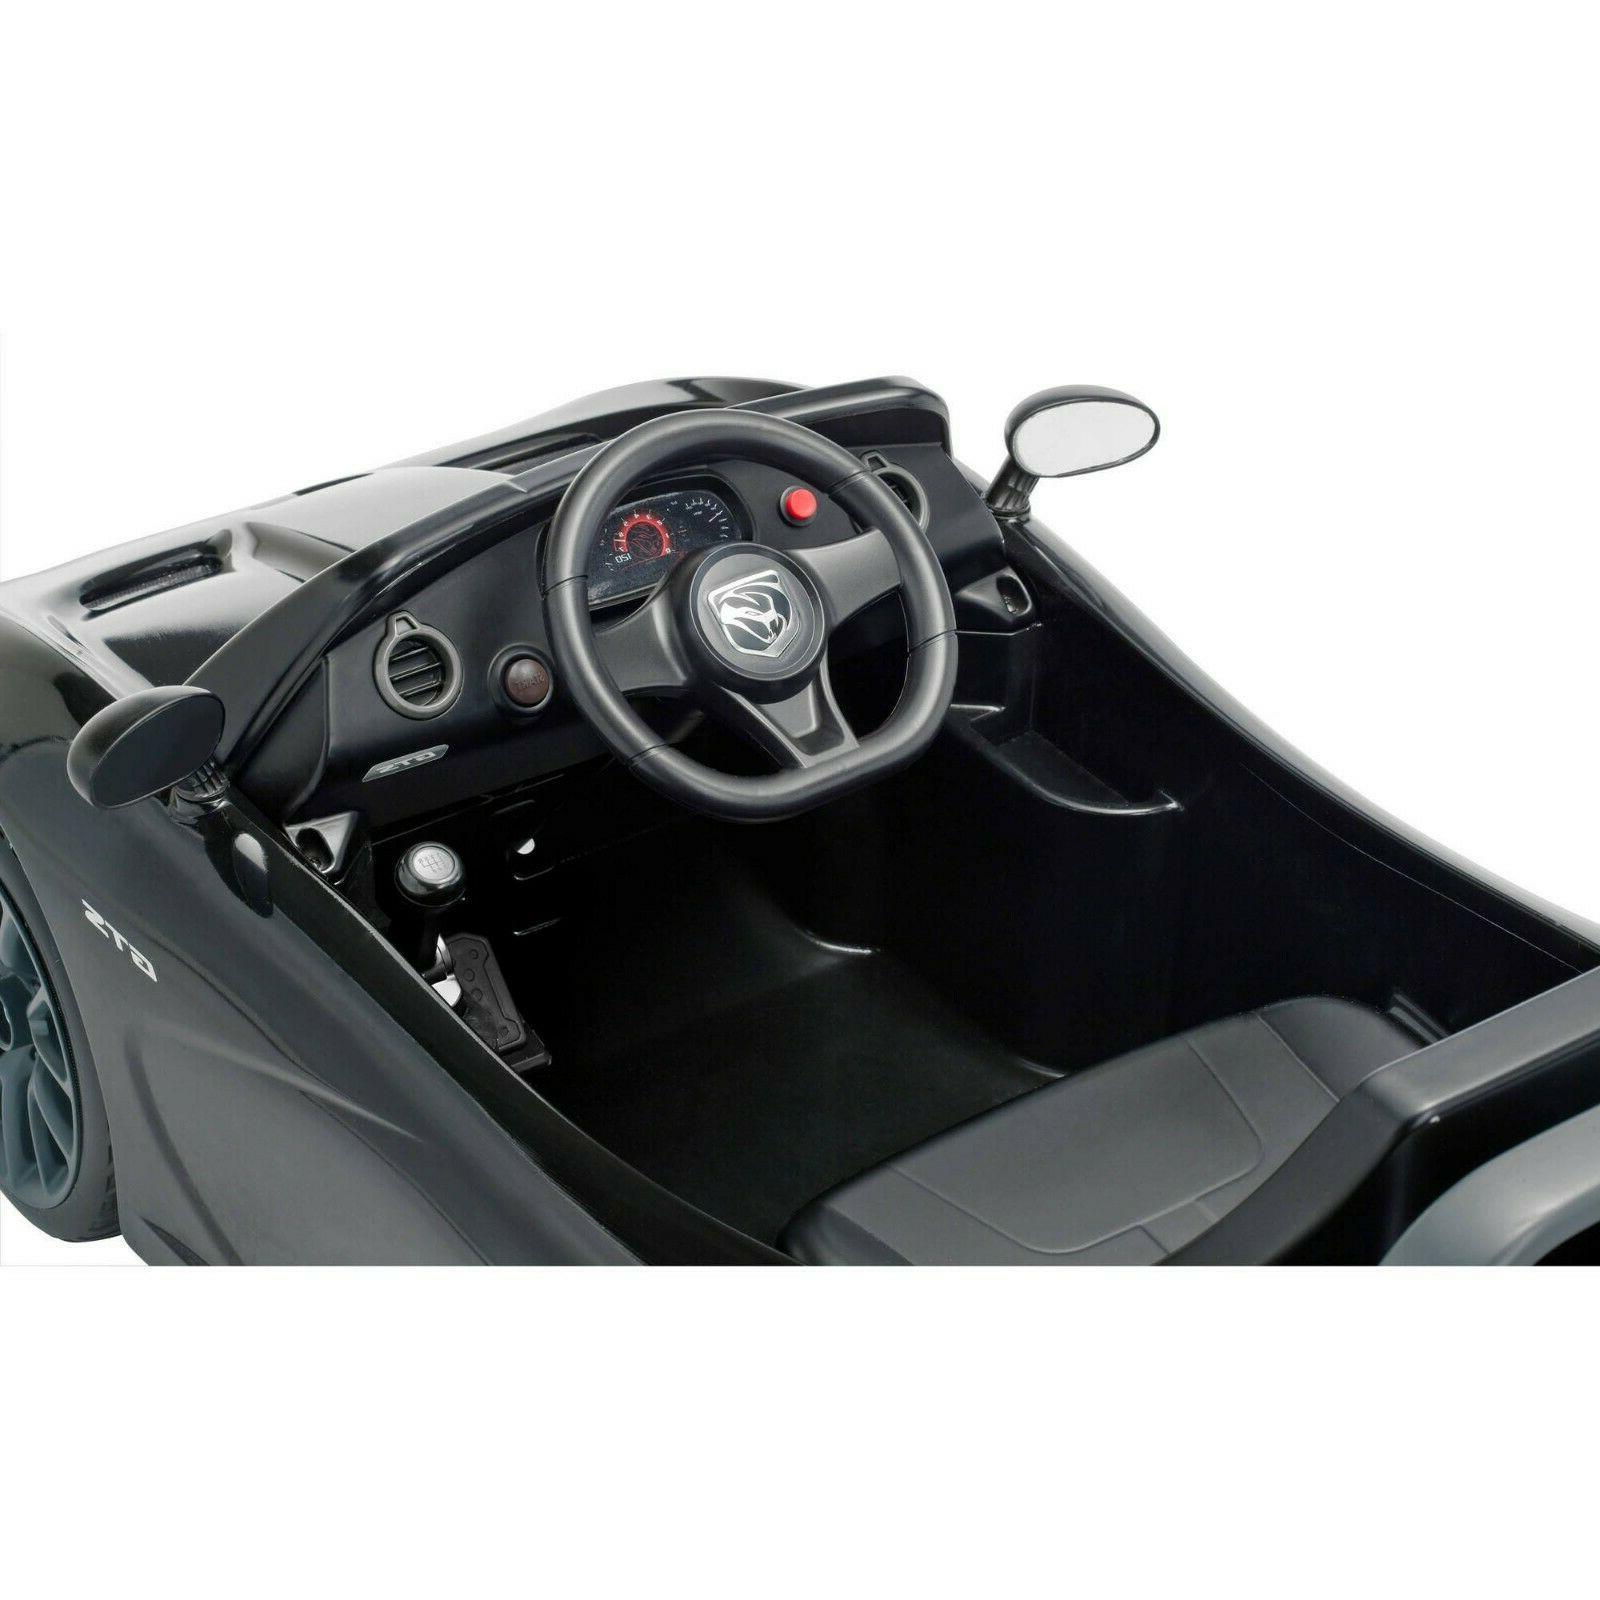 Battery Powered Car Kids Ride 6V Electric Viper Black